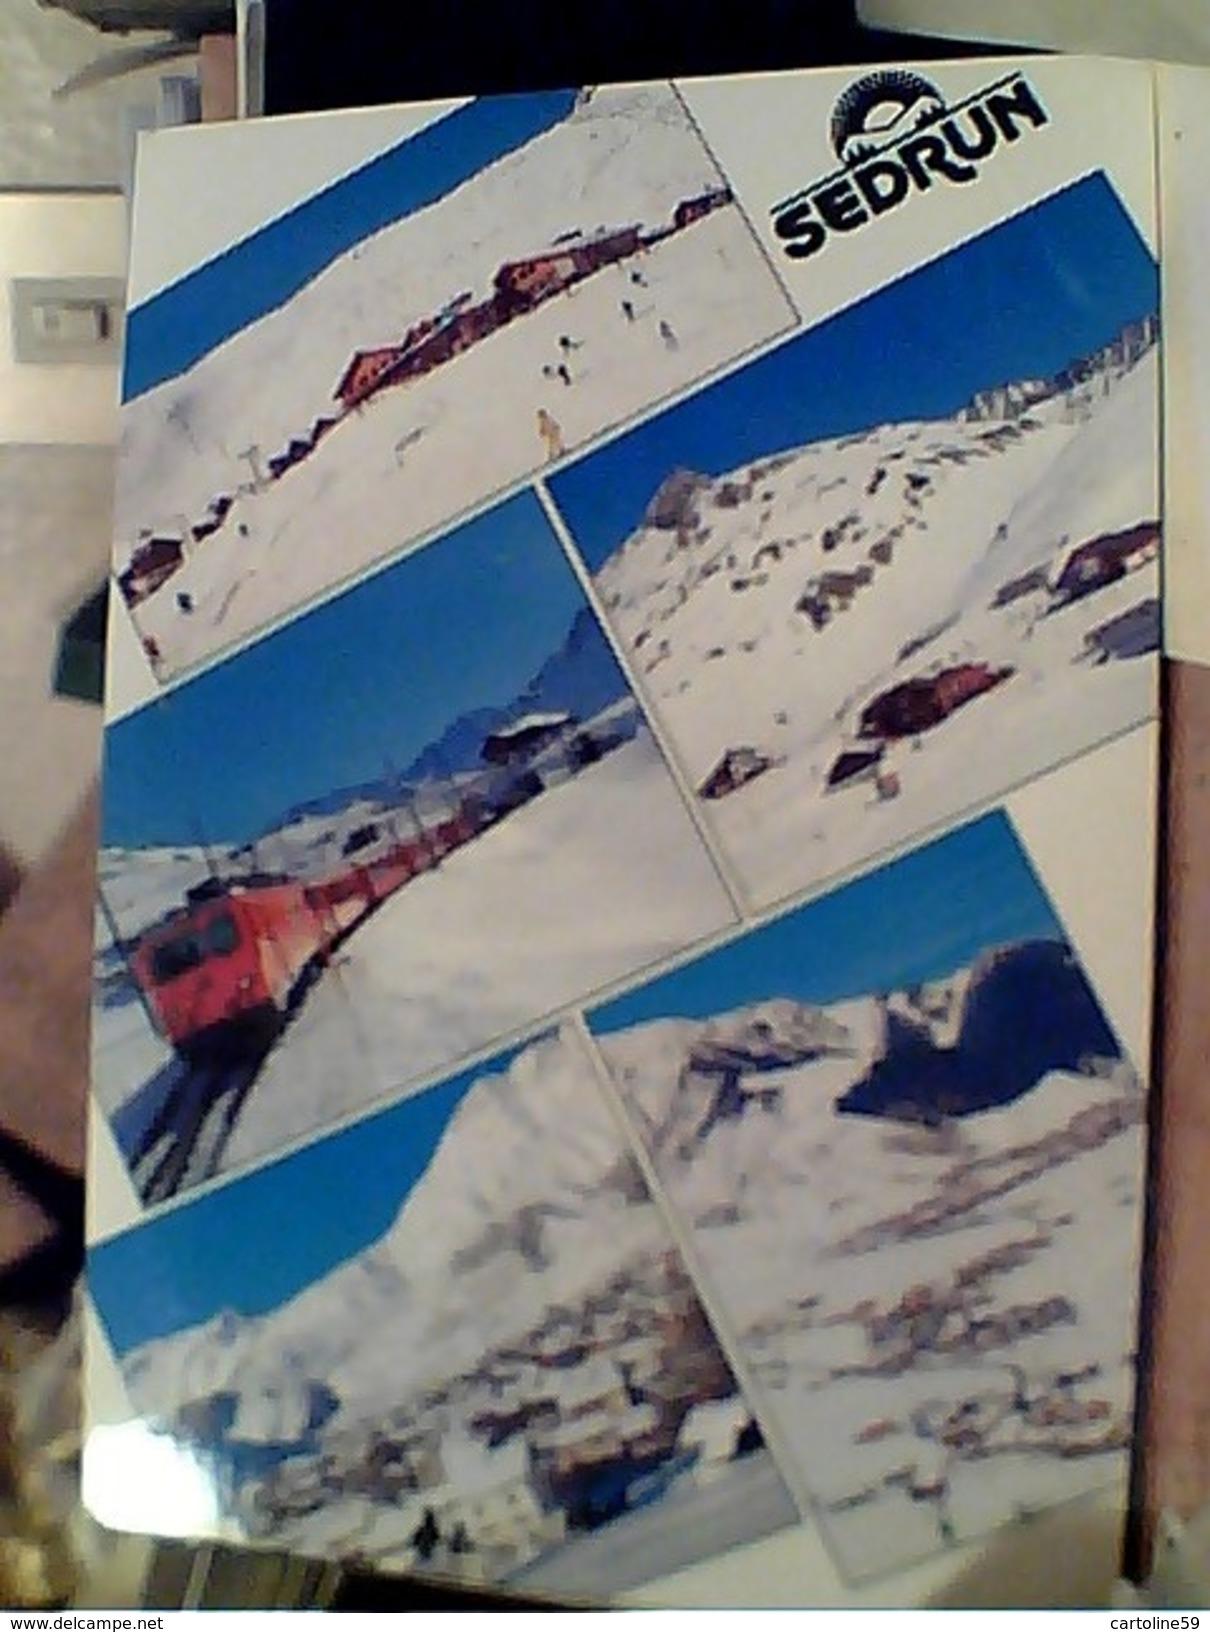 SUISSE SVIZZERA SEDRUN GRAUBUNDEN TRENO TRAIN BAHN  STAMP TIMBRE SELO Buch E Presse  60 VB1994  GC13795 - ZG Zoug